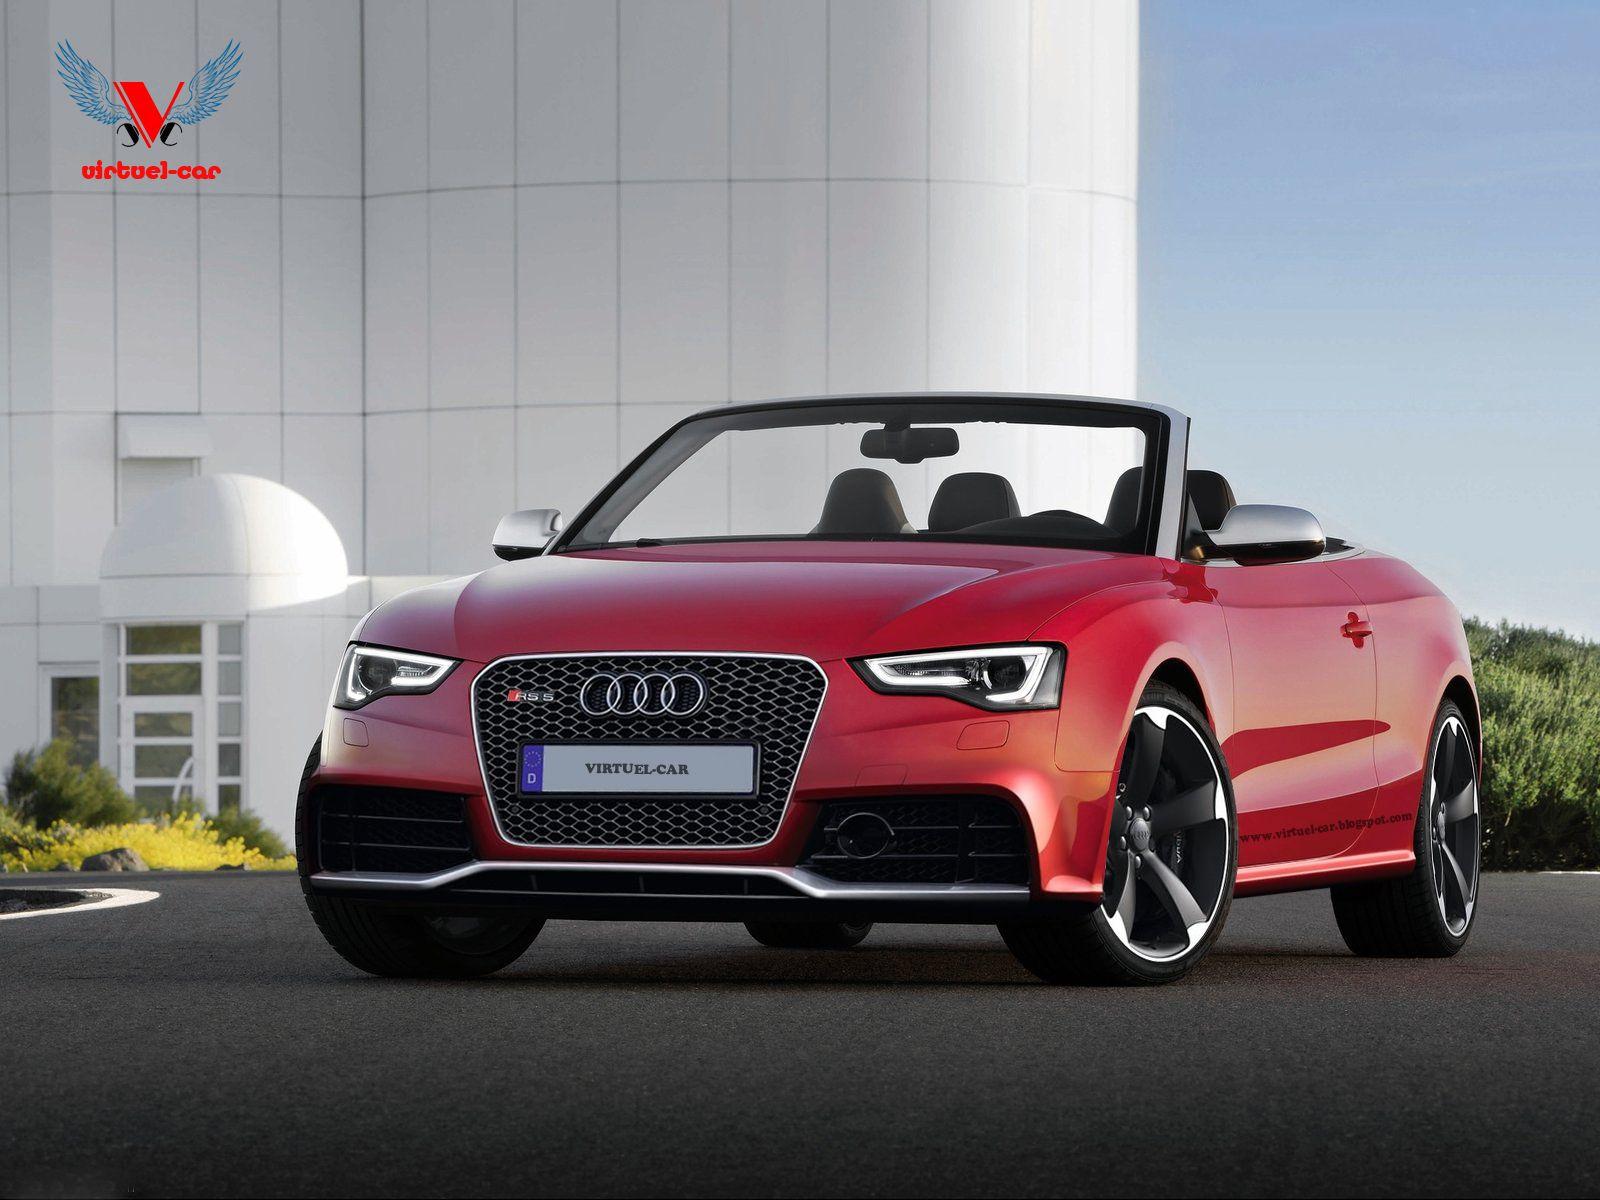 2014 Audi Rs5 Convertible Google Search Audi S5 Audi Rs5 Audi